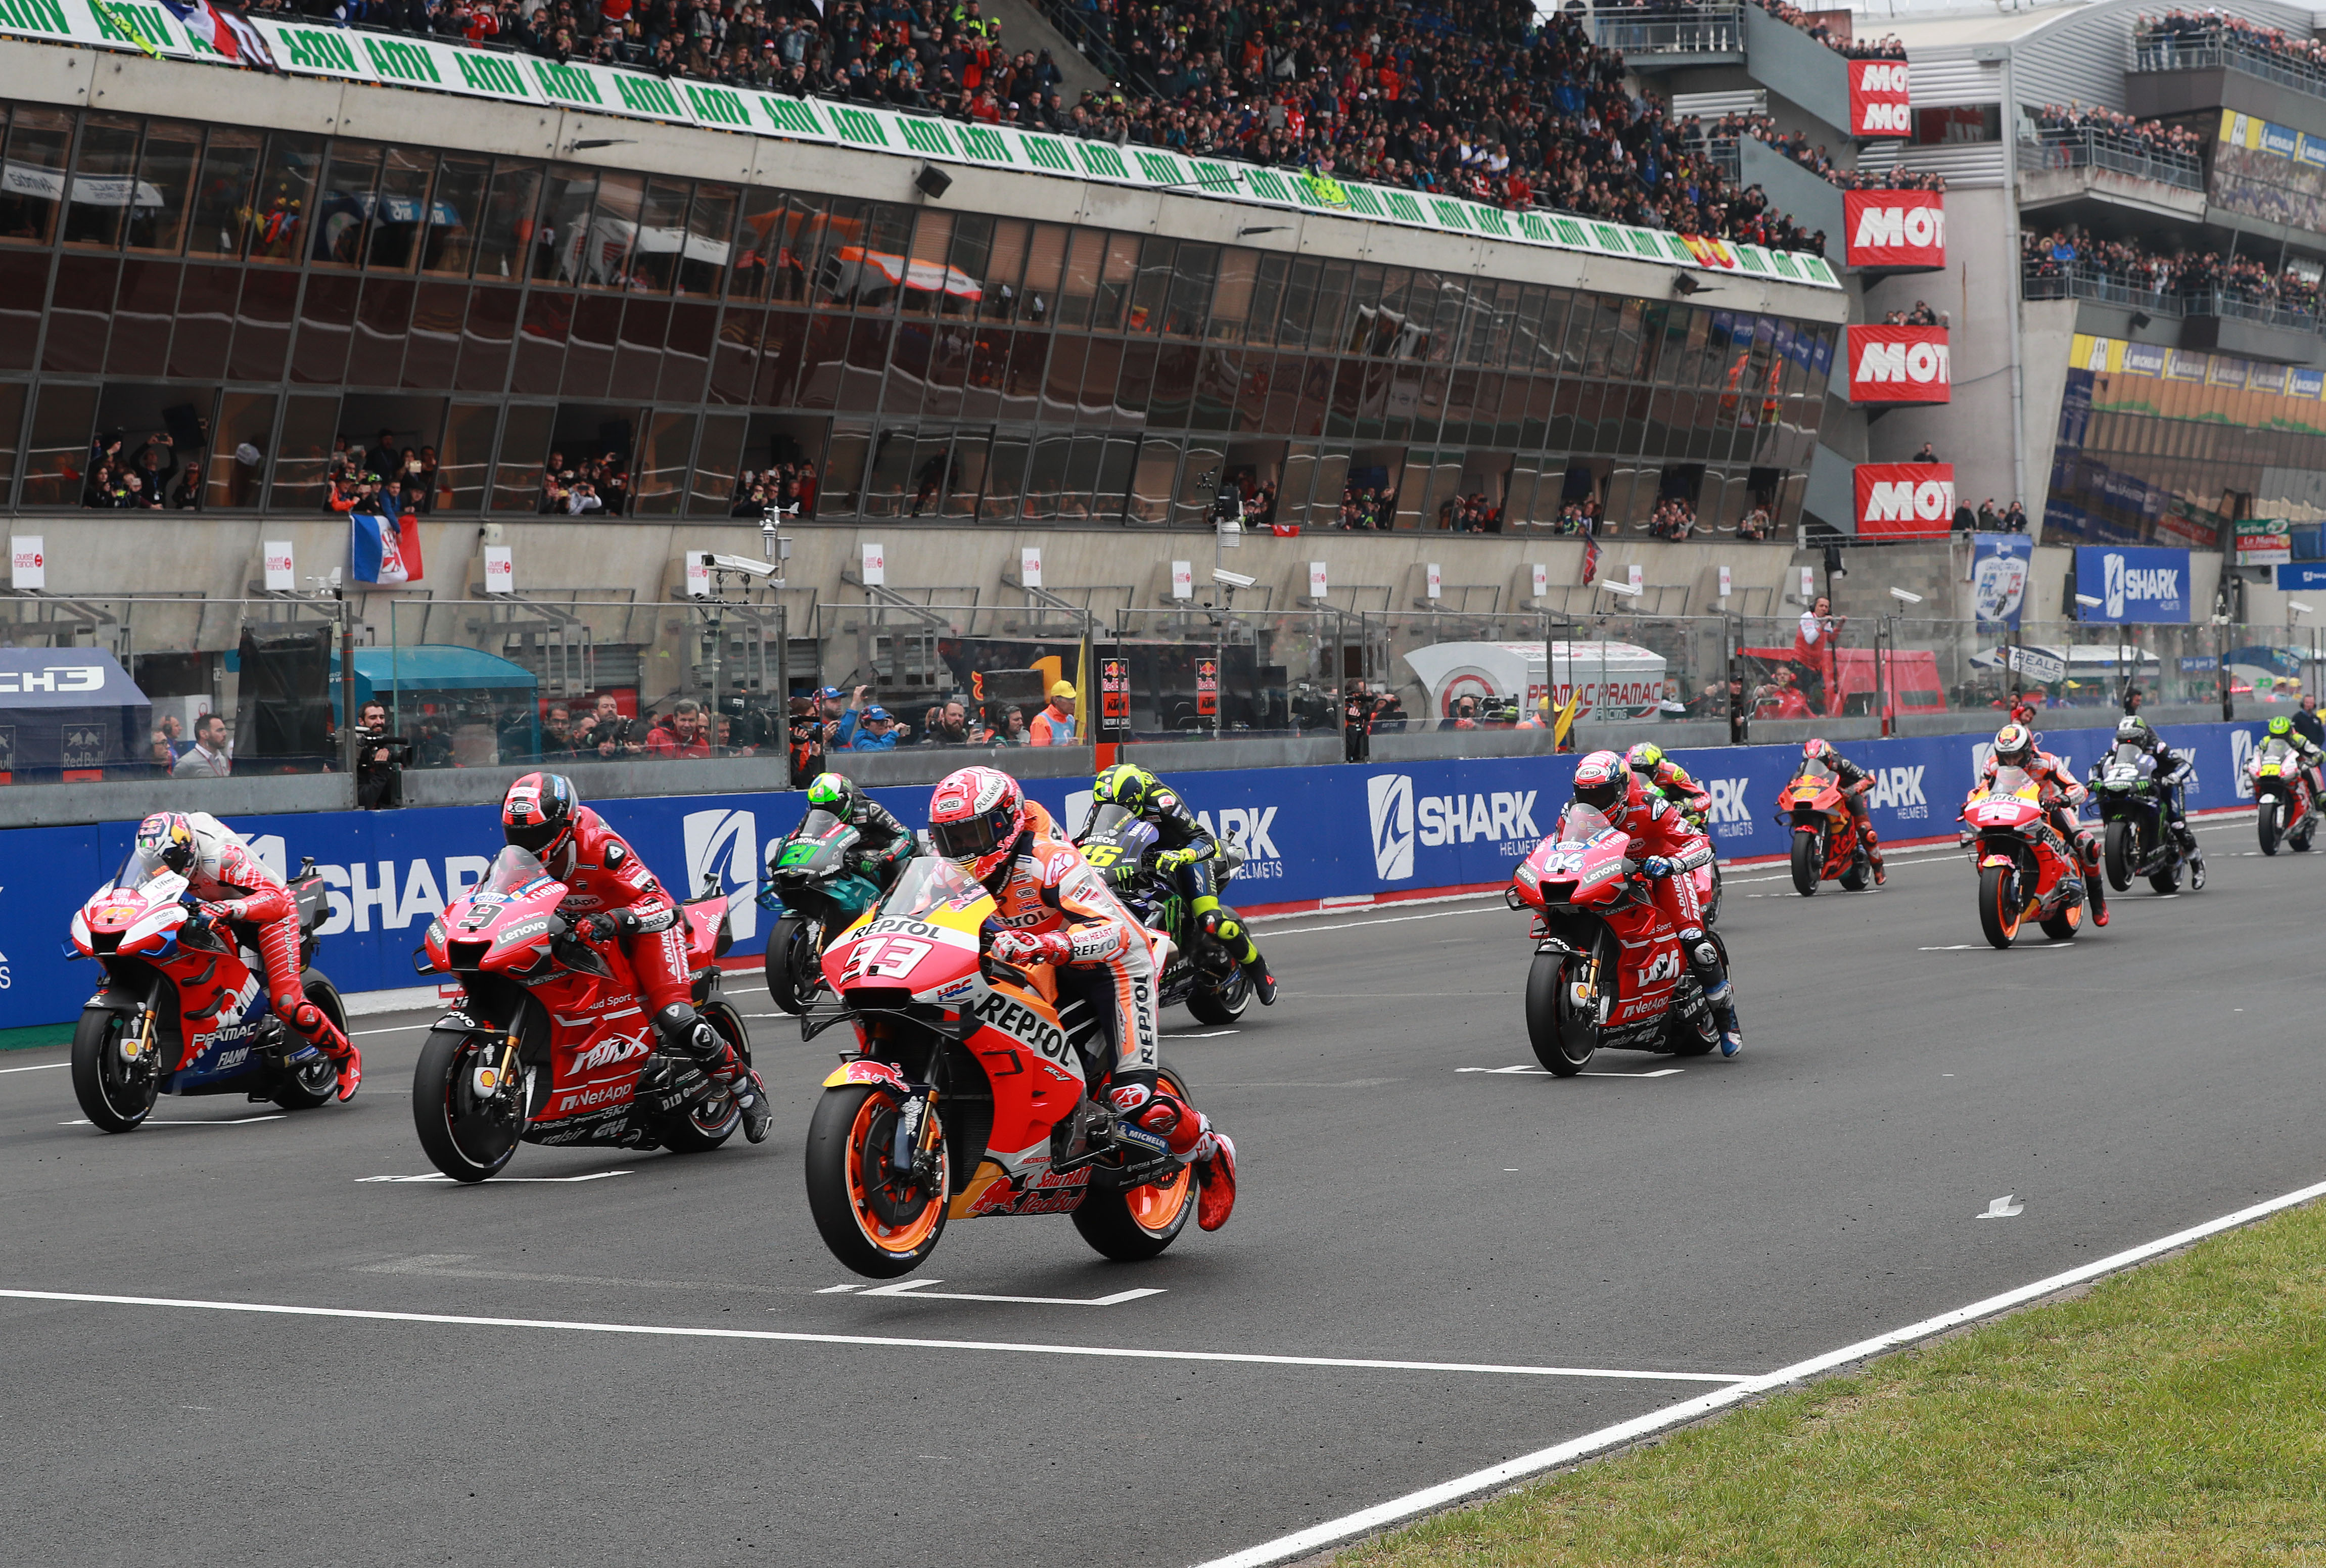 Motogp Unveils New 2020 Calendar With Five Double Headers The Race